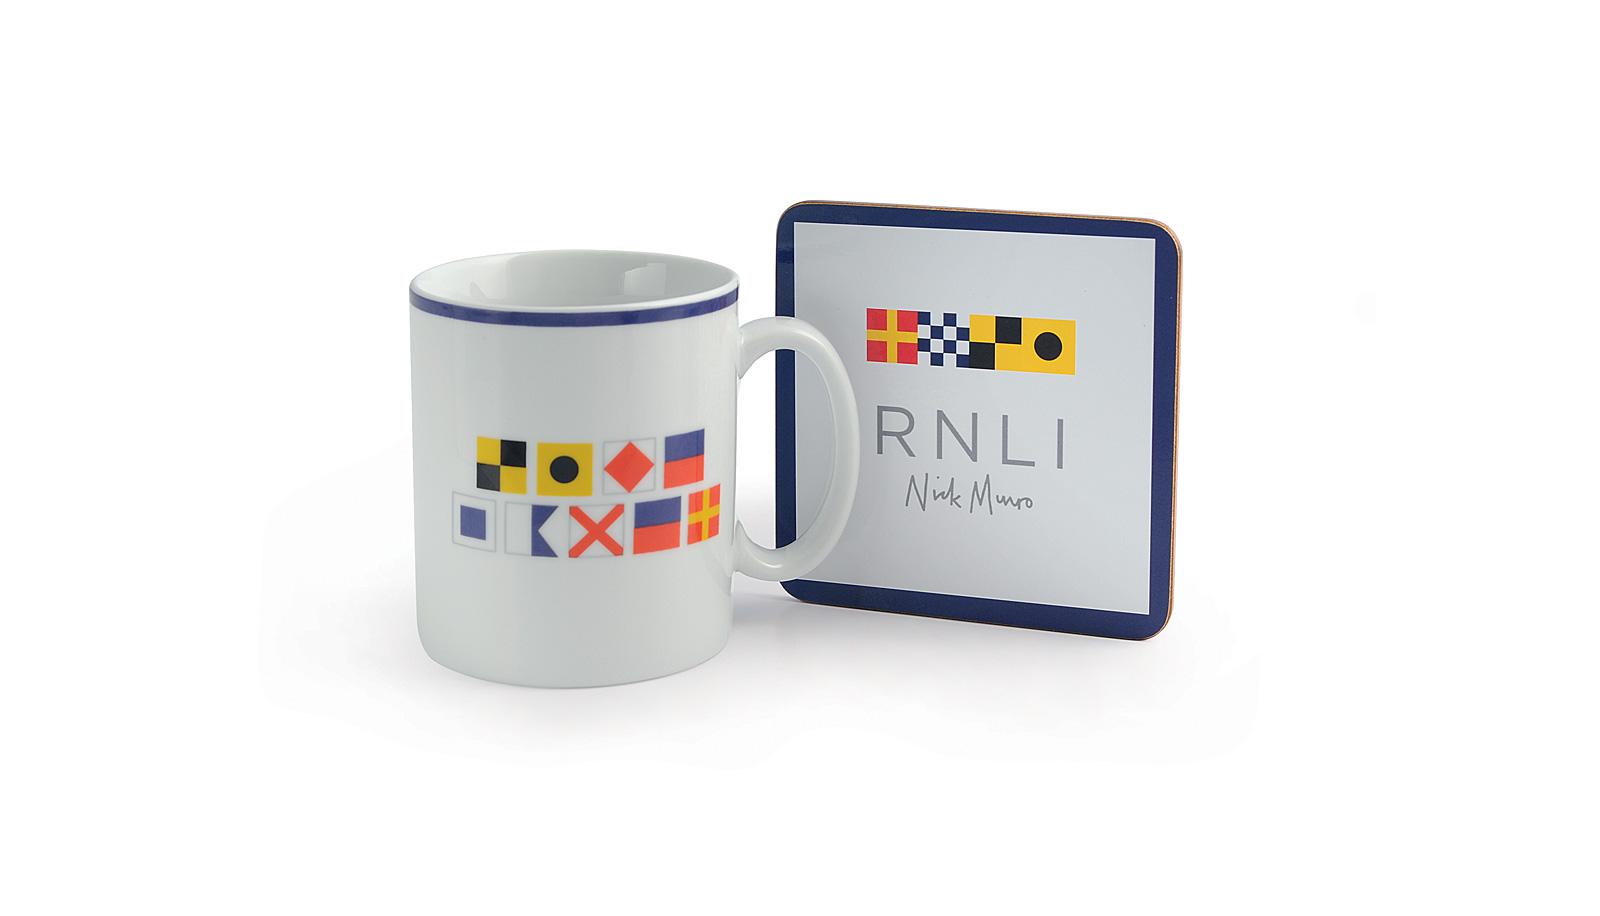 nm_rnli_mug_coaster